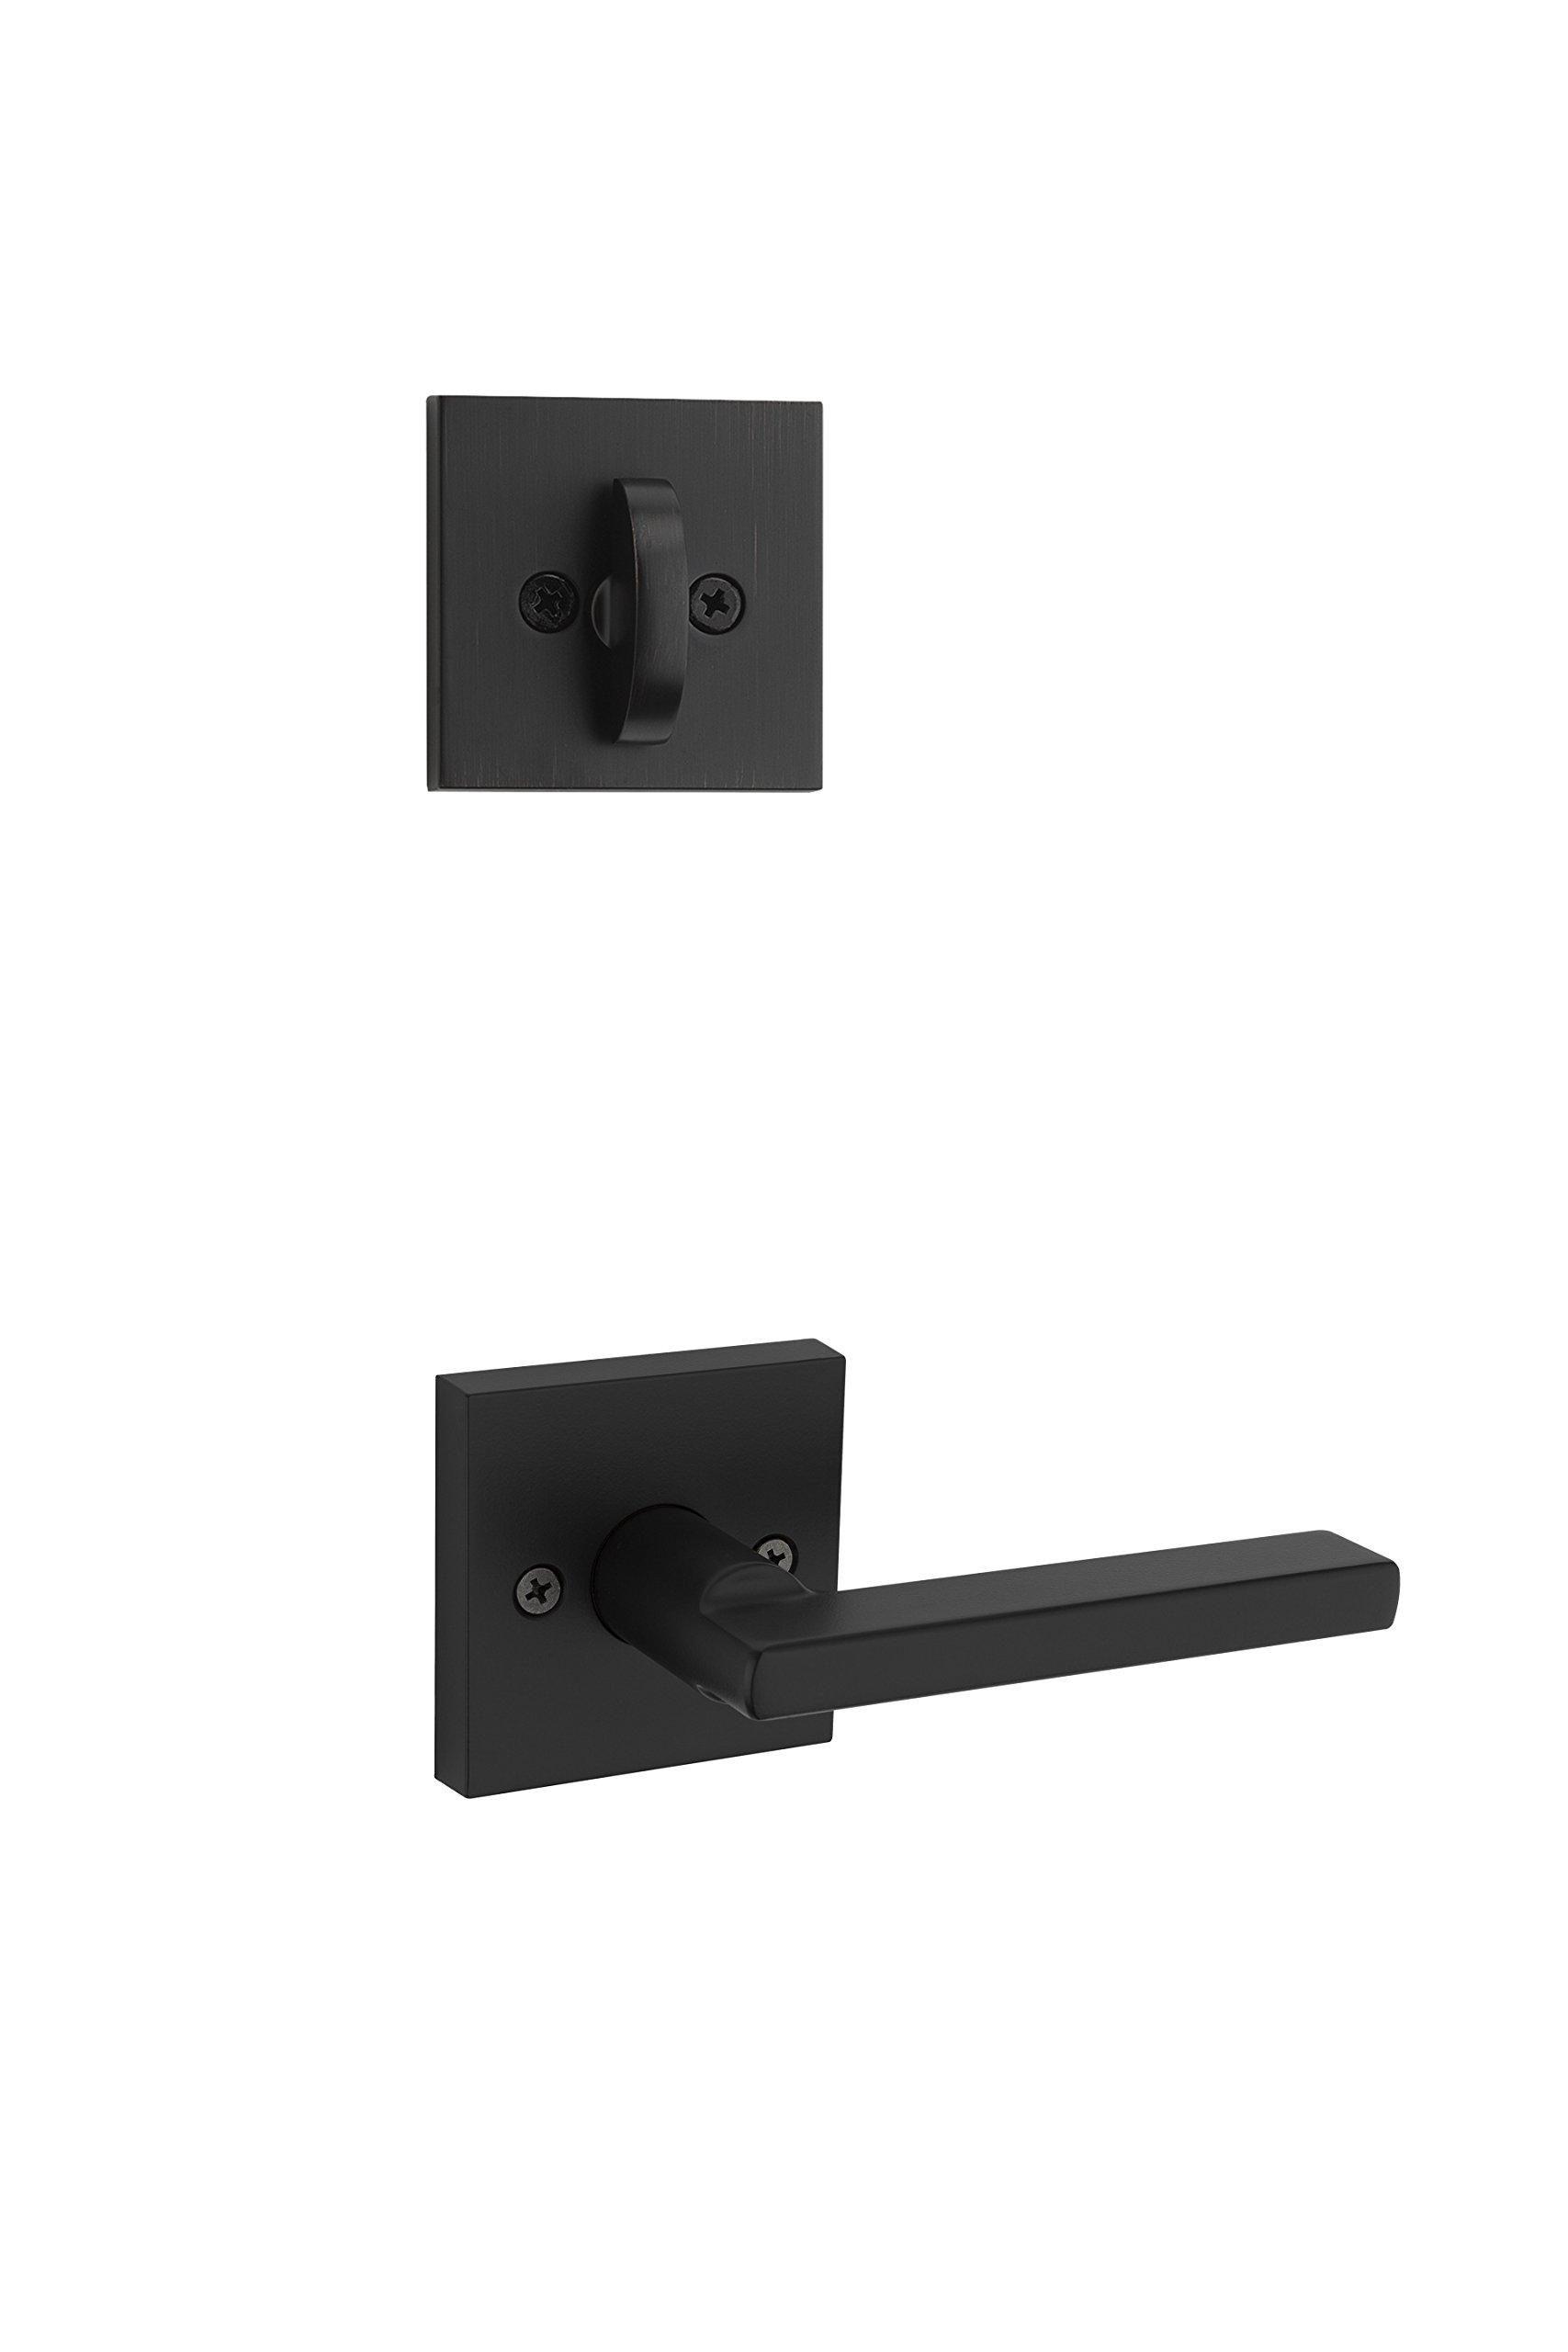 Kwikset 966HFL SQT 514 Halifax Square Single Cylinder Interior Pack Lever, Iron Black